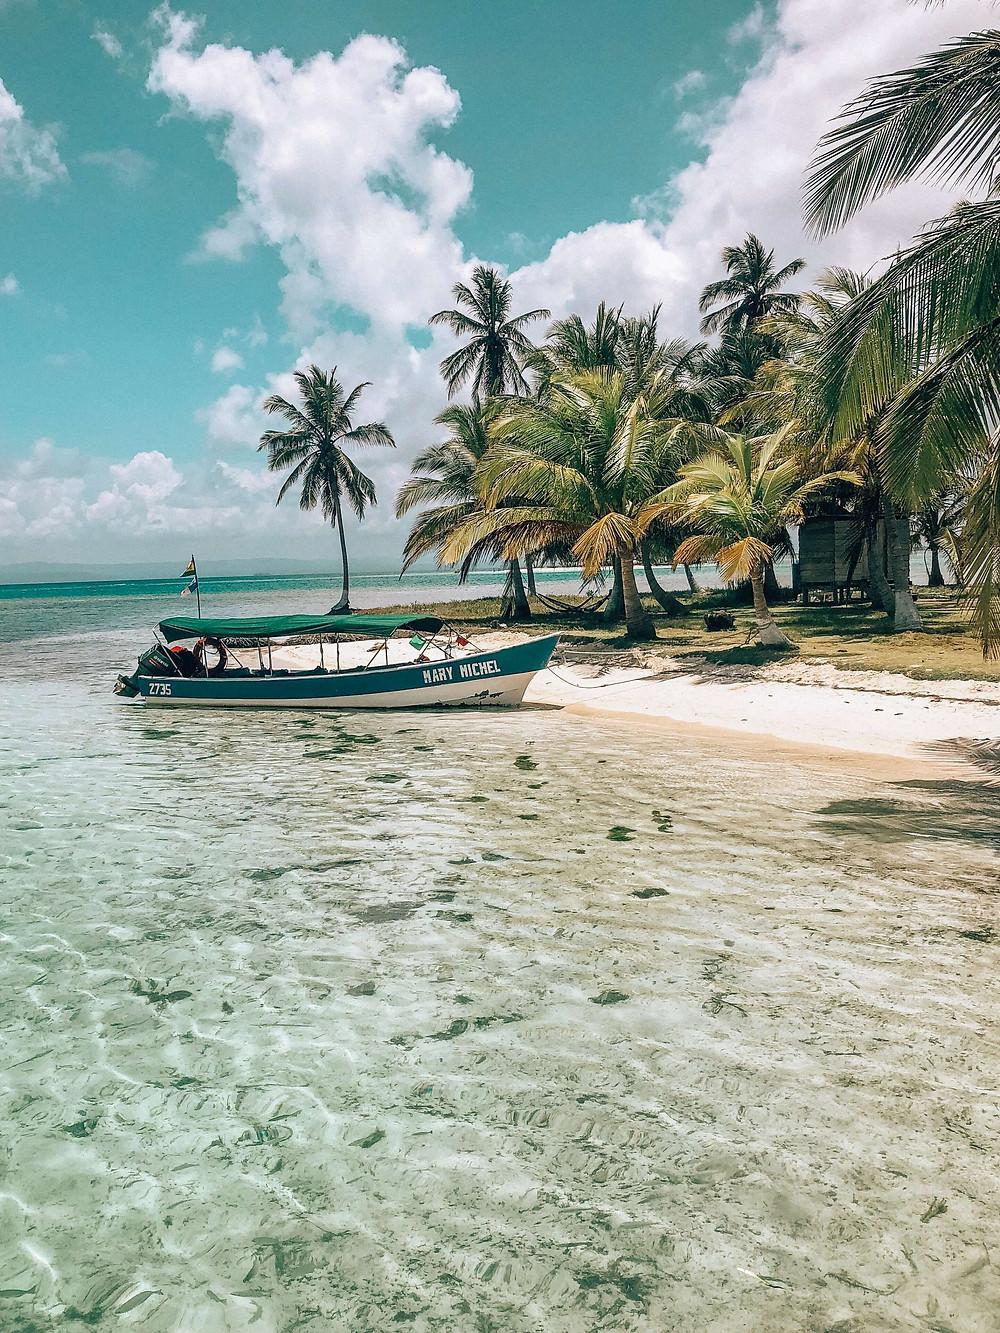 local kuna panga speed boat tied up to a palm tree in San Blas Panama